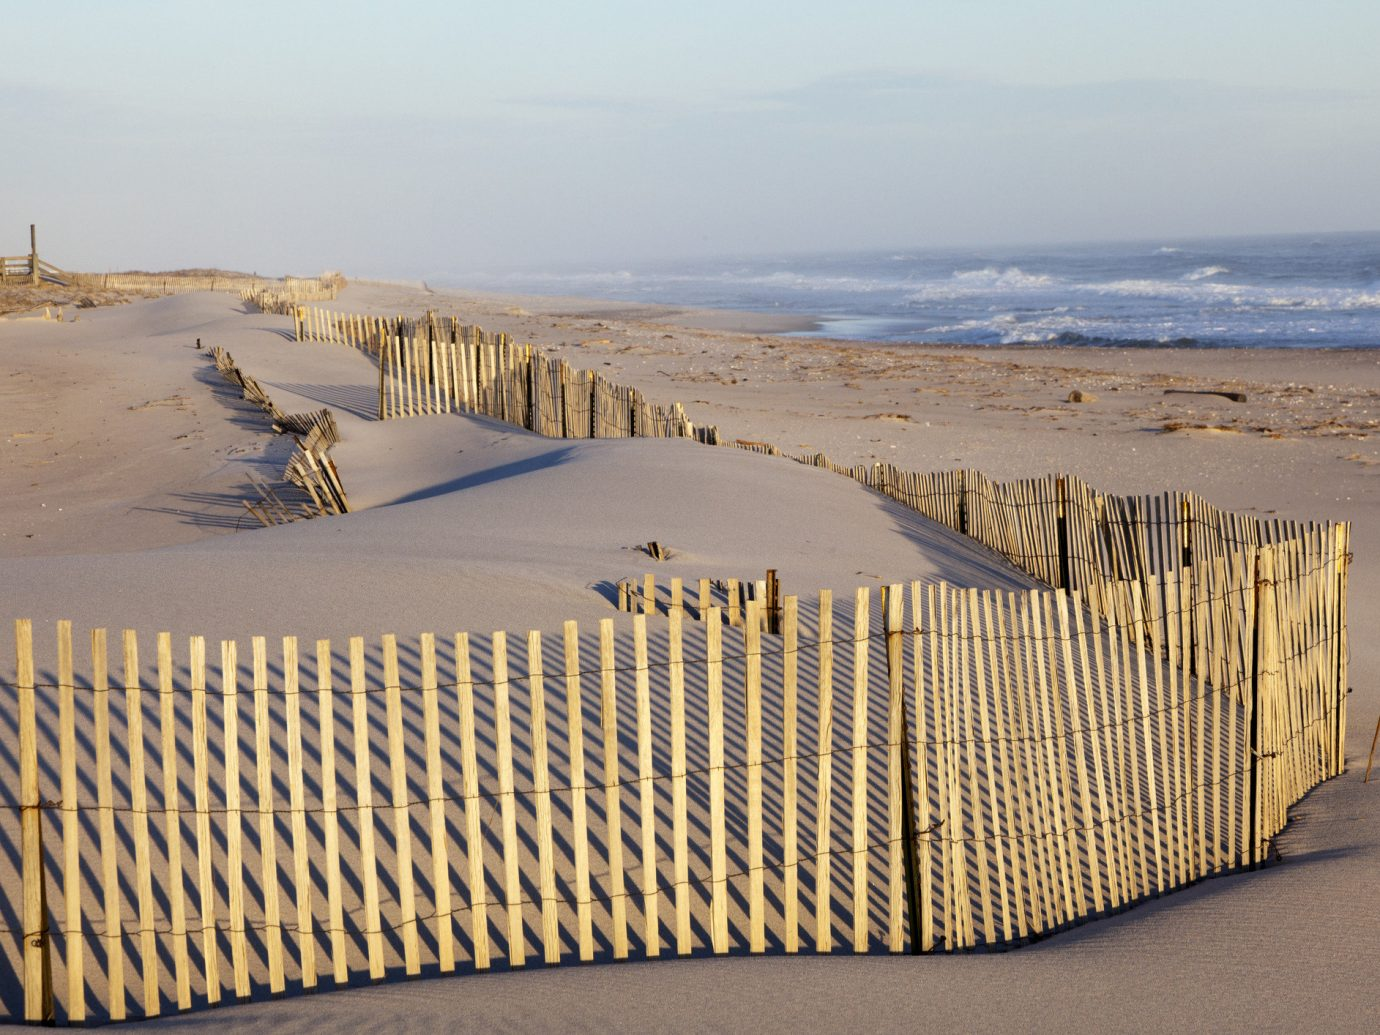 Trip Ideas sky outdoor habitat sand Beach natural environment shore Coast Sea dune aeolian landform Ocean wood landscape terrain material Desert sandy